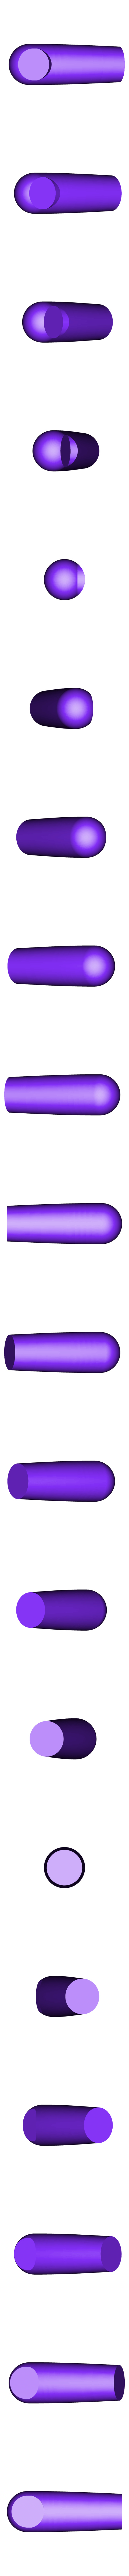 Arm_2X.STL Download STL file Grimlock • Model to 3D print, biglildesign